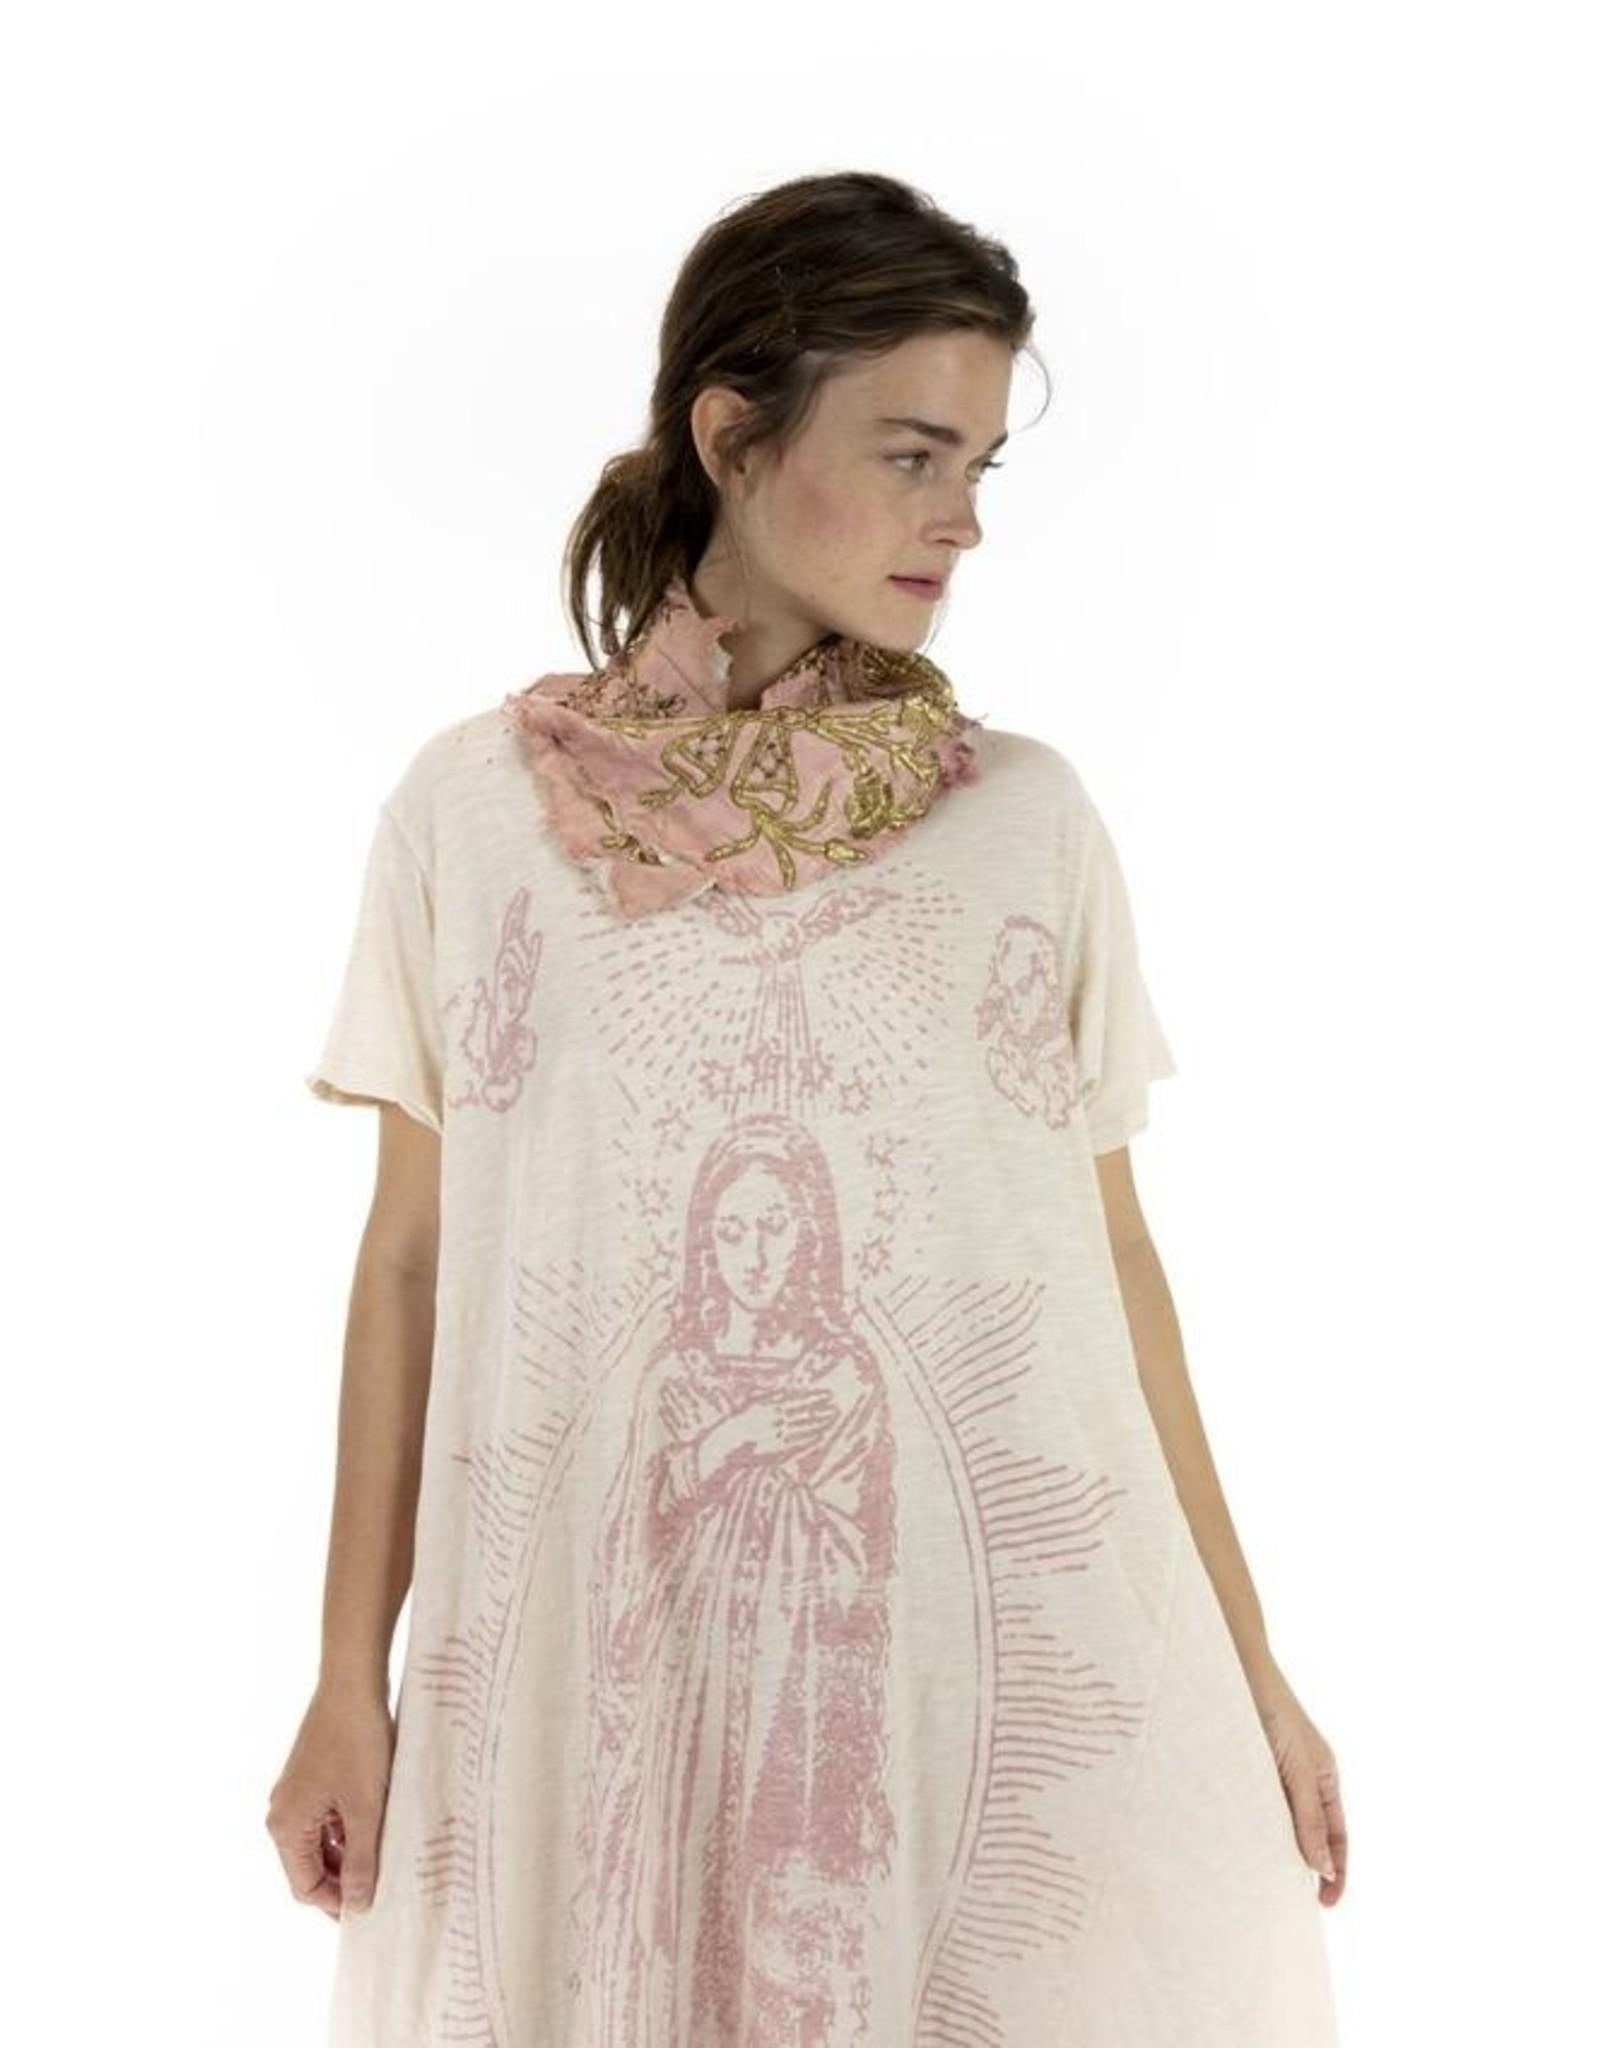 Magnolia Pearl Mary of Prosperity T Dress - Petal